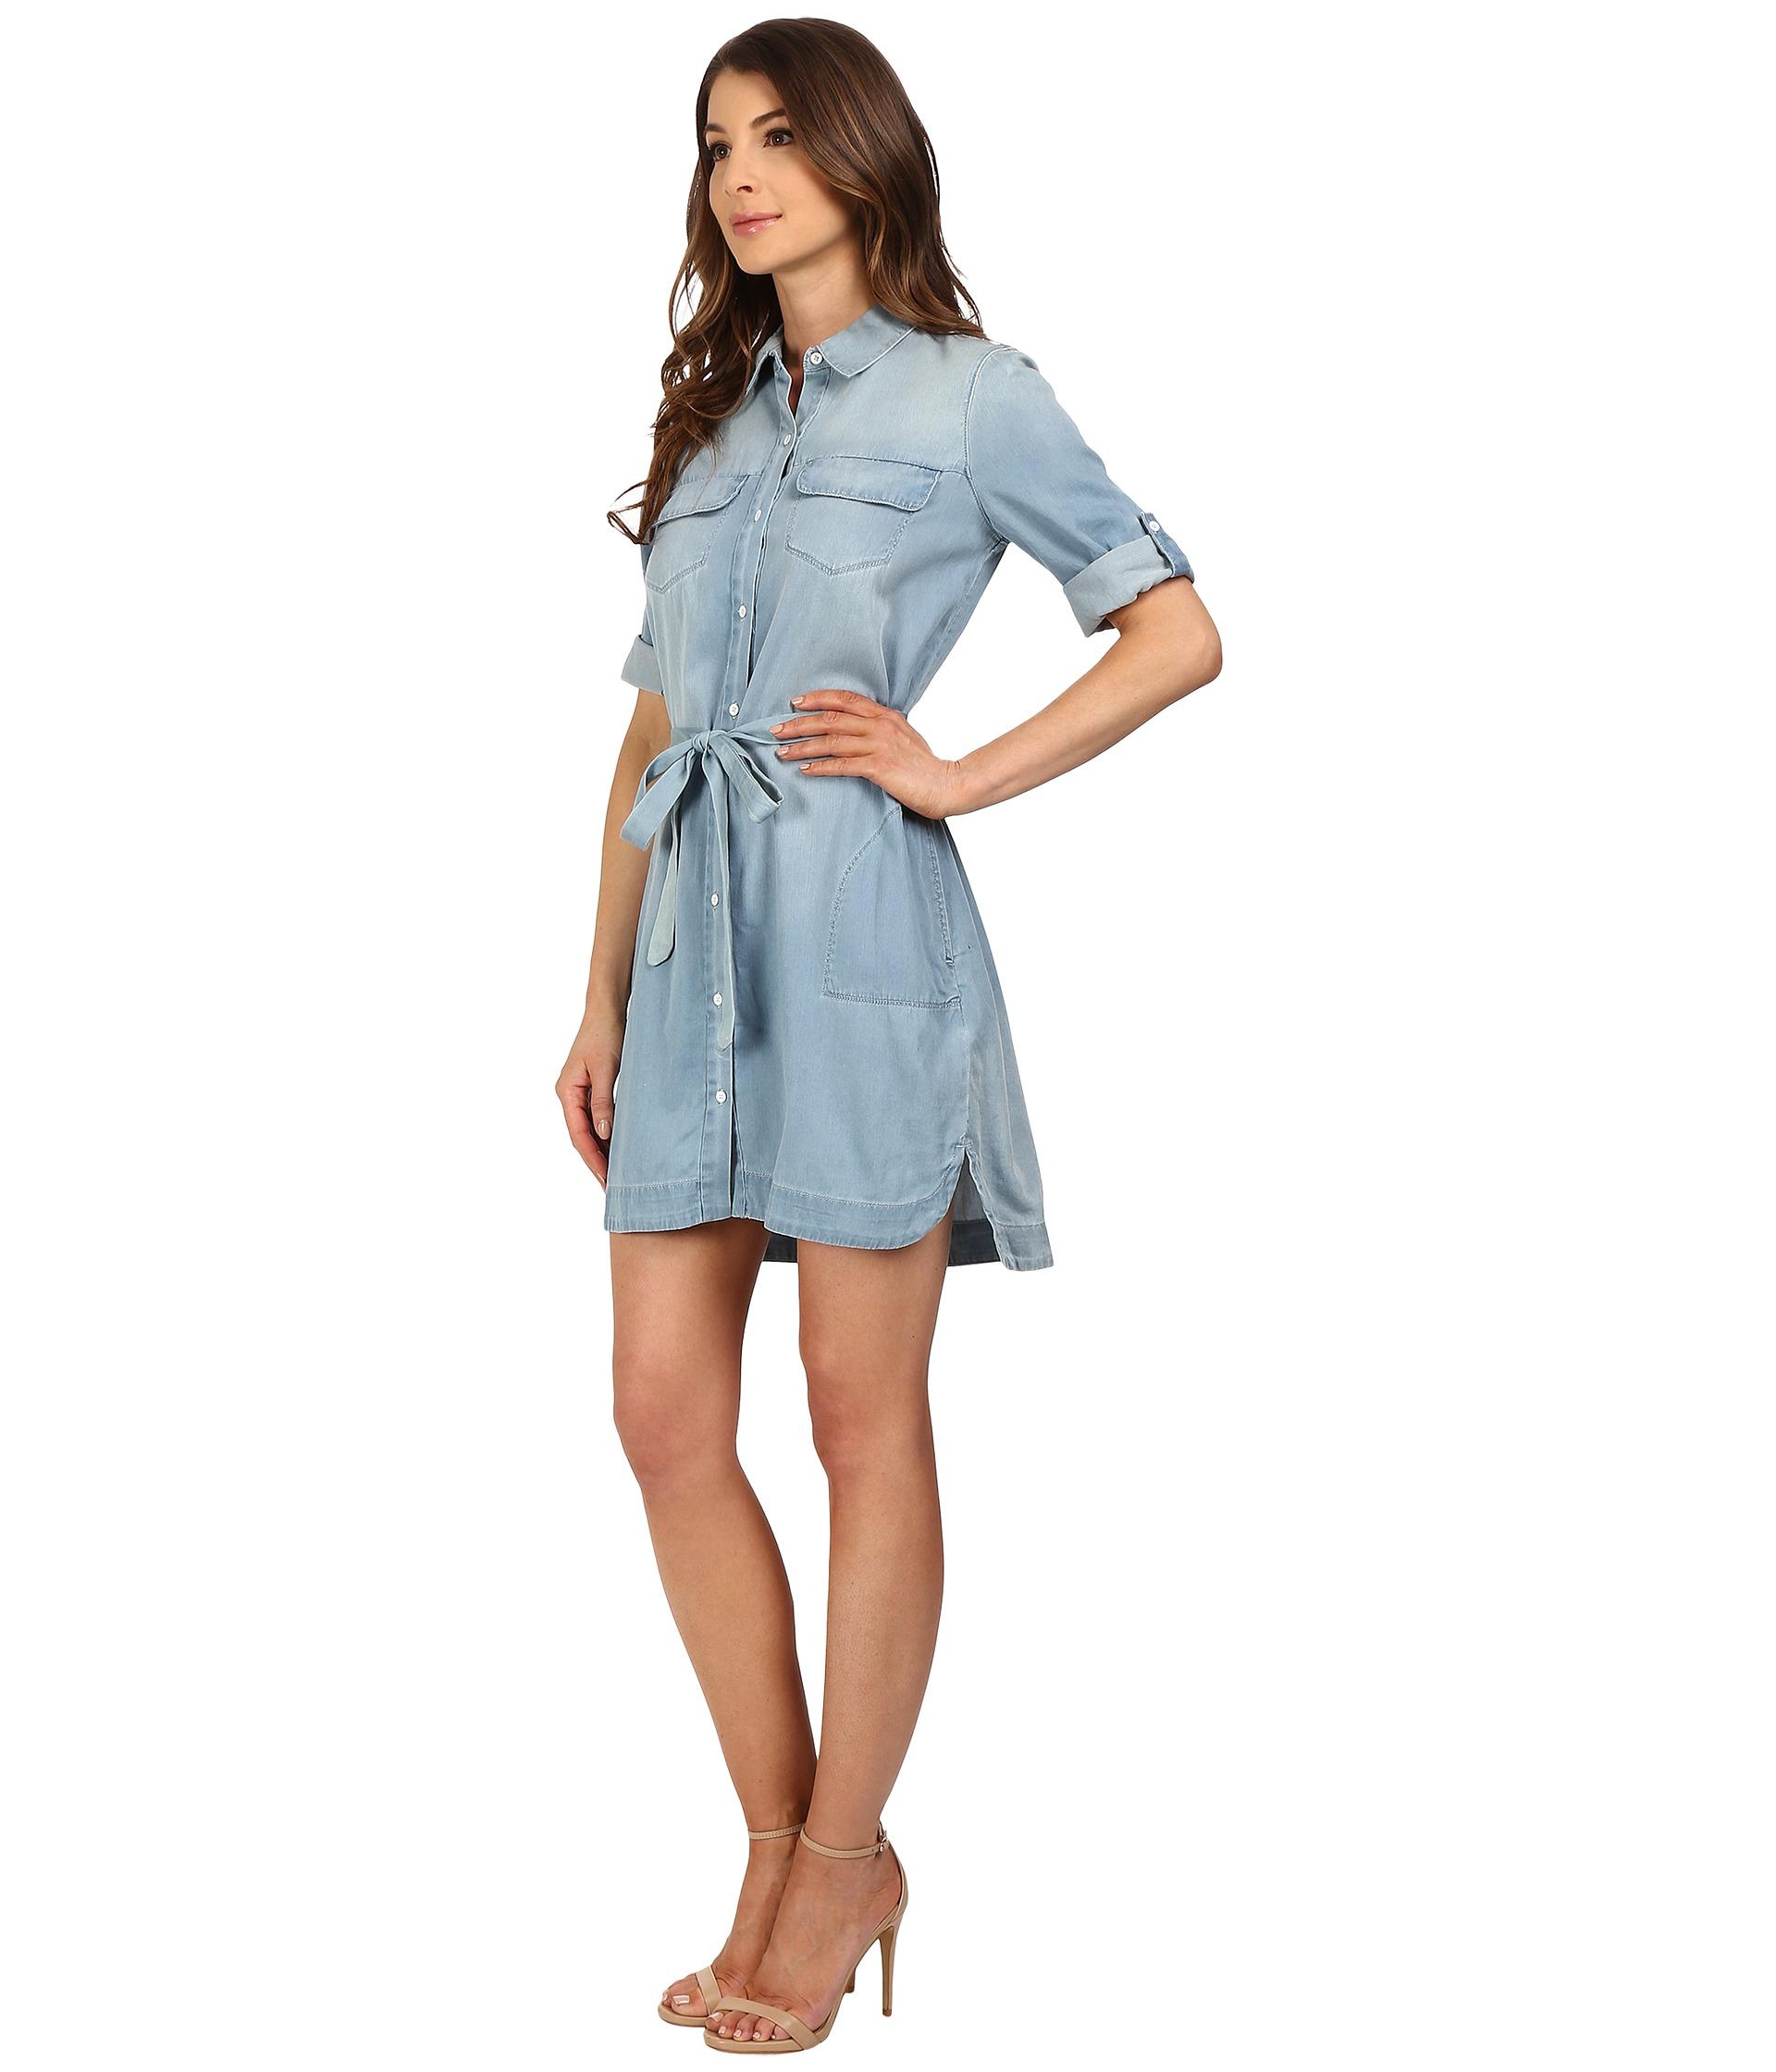 Official Site Cheap Price Nicekicks For Sale Denim dress Calvin Klein Jeans uIG9yNJ